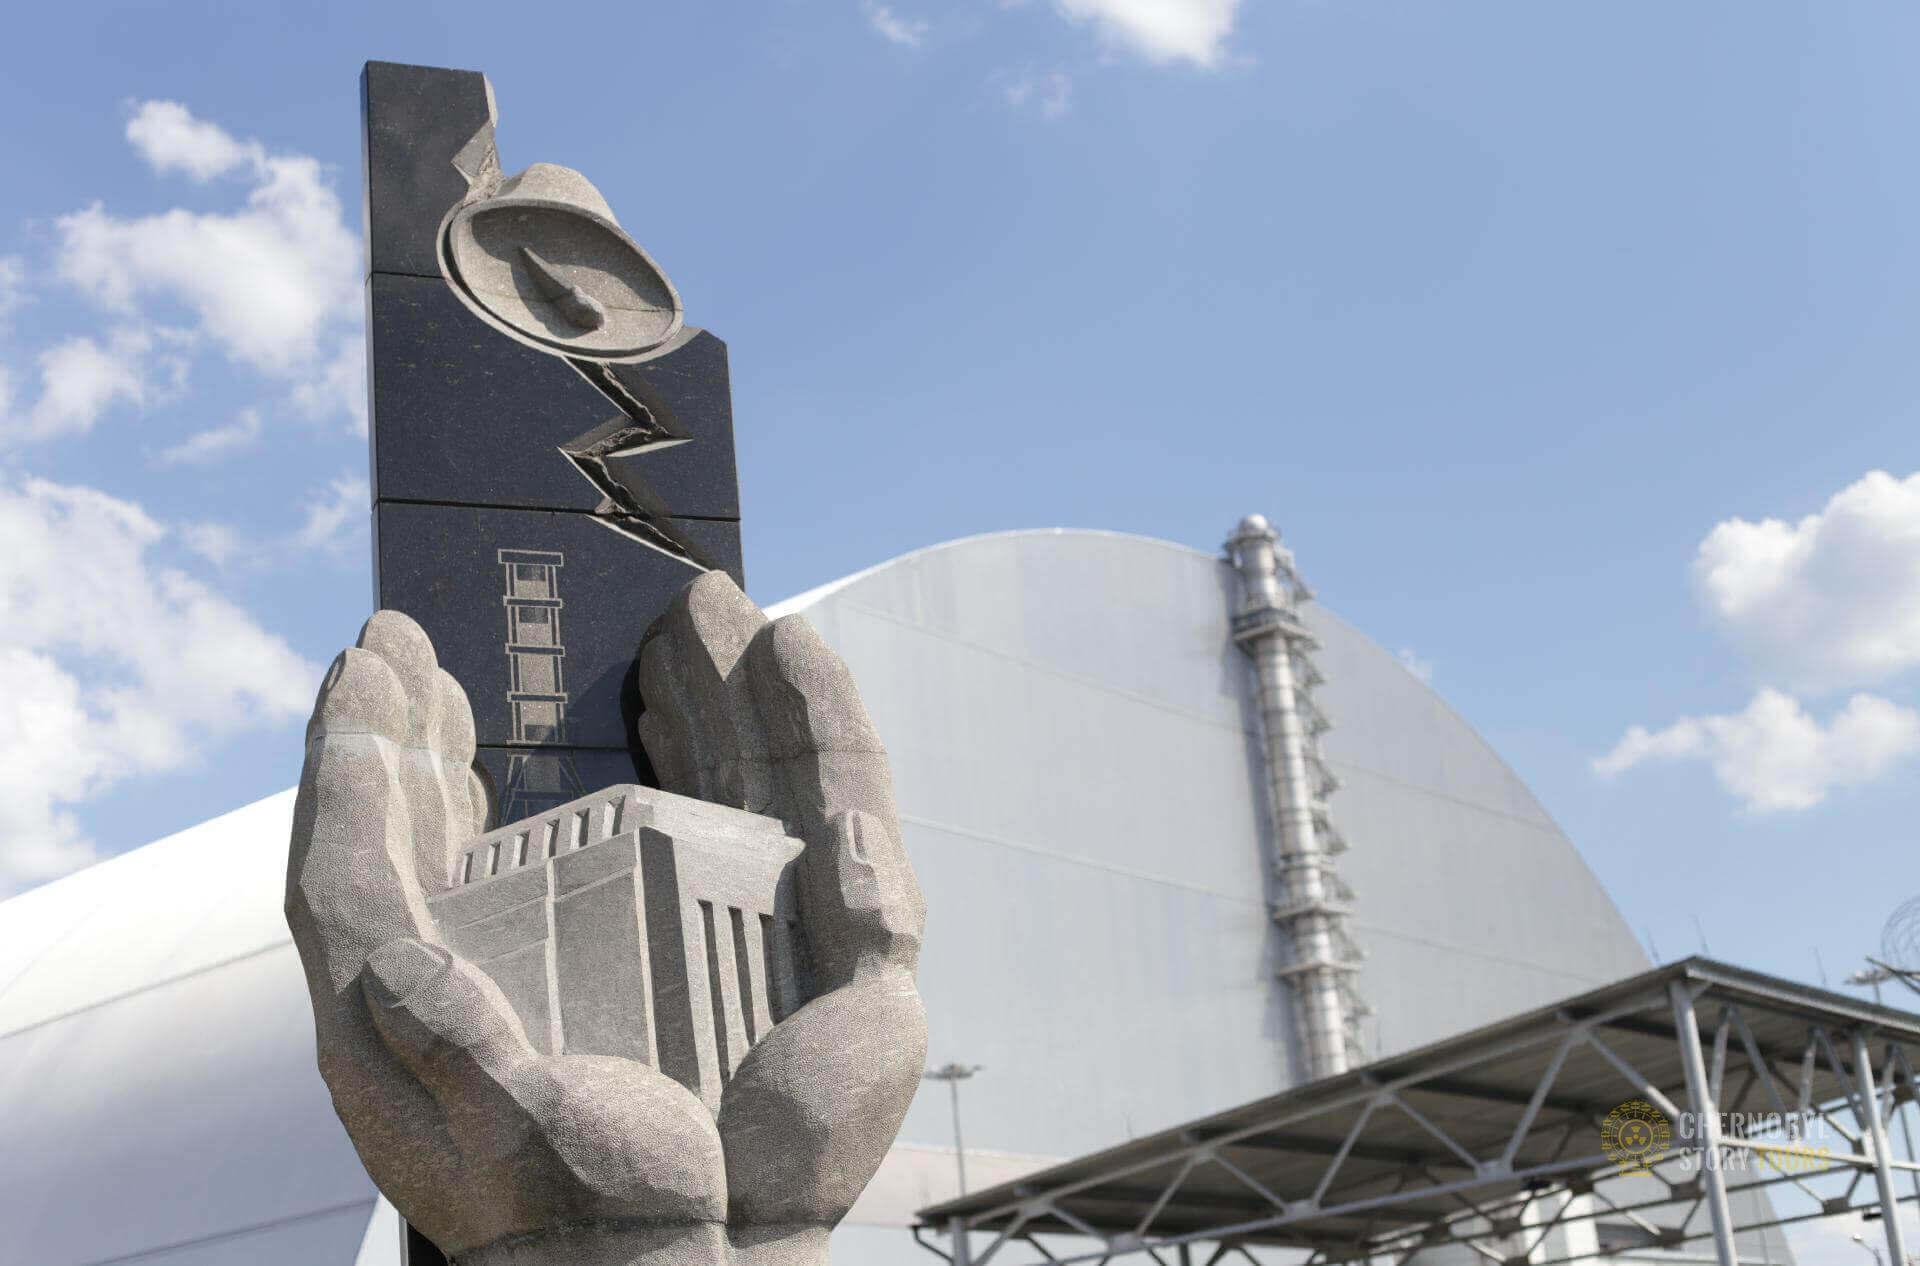 Chernobyl Sarcophagus by chernobylstory.com